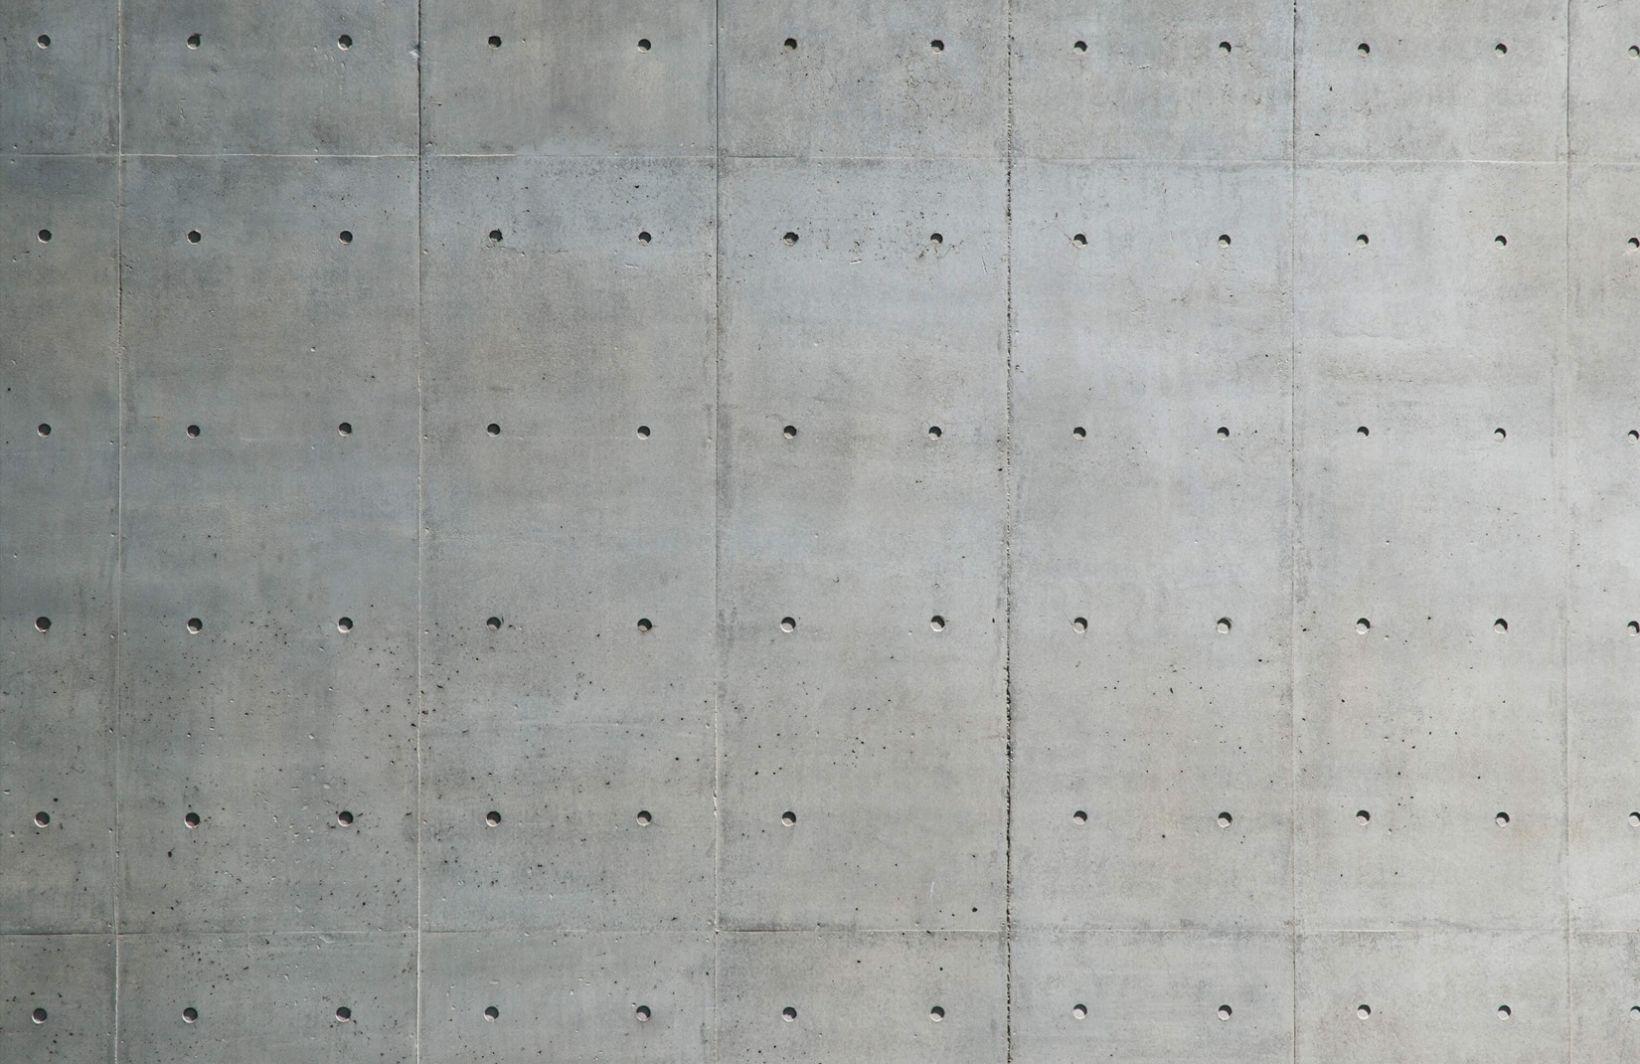 Bare Concrete Wallpaper Mural Texture│Material in 2019